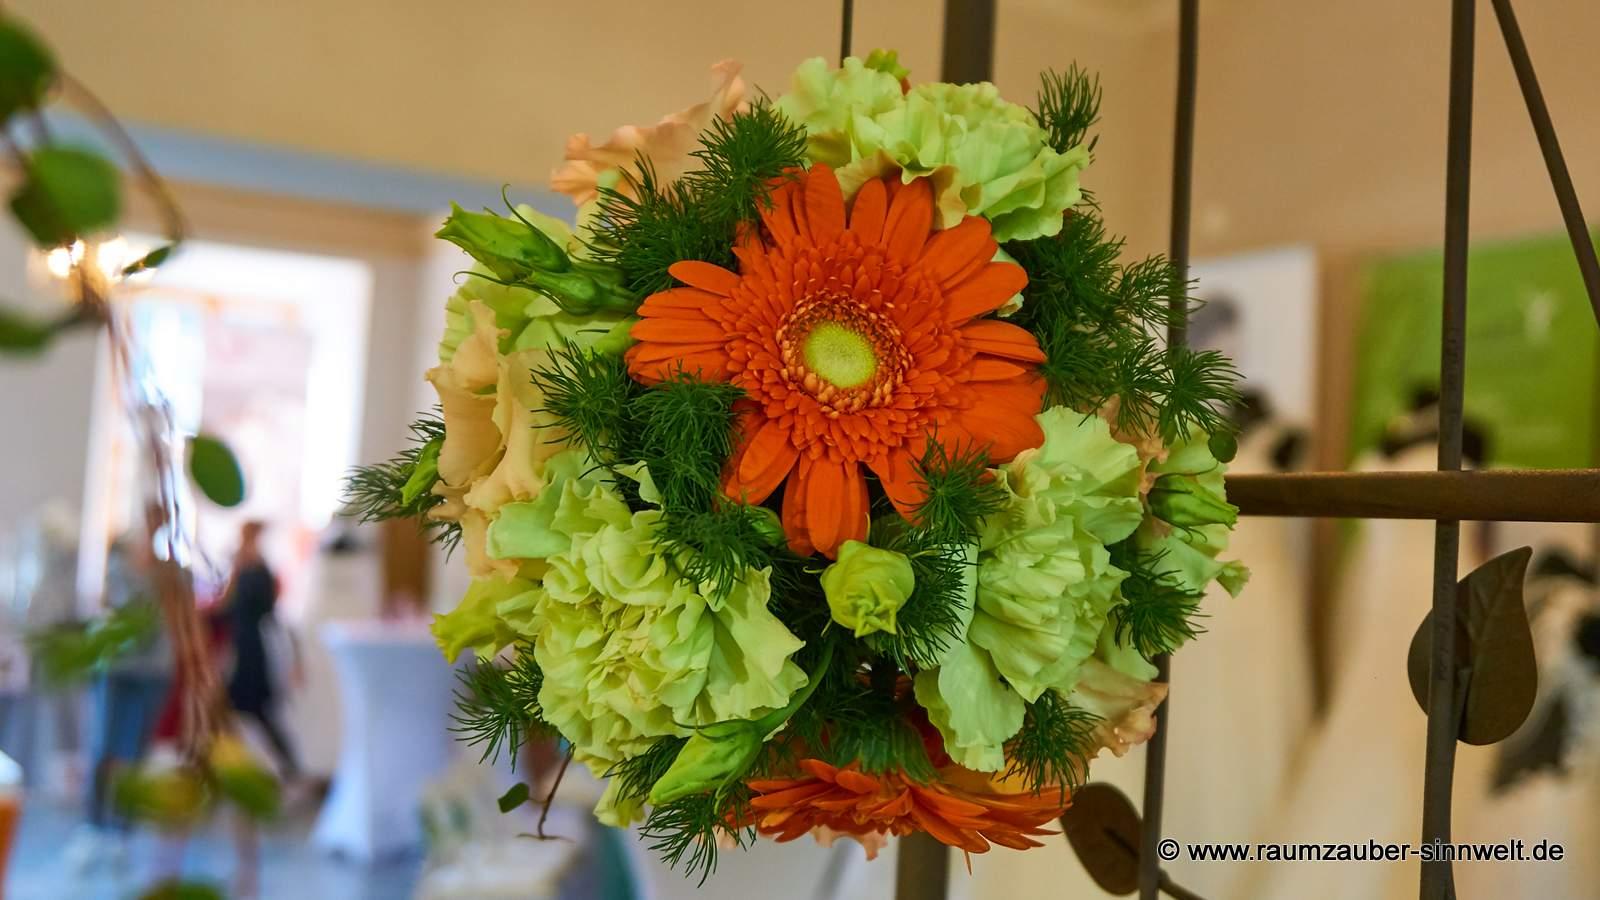 Blütenkugel aus Gerbera, Nelken und Eustoma als Altar- oder Standesamtschmuck